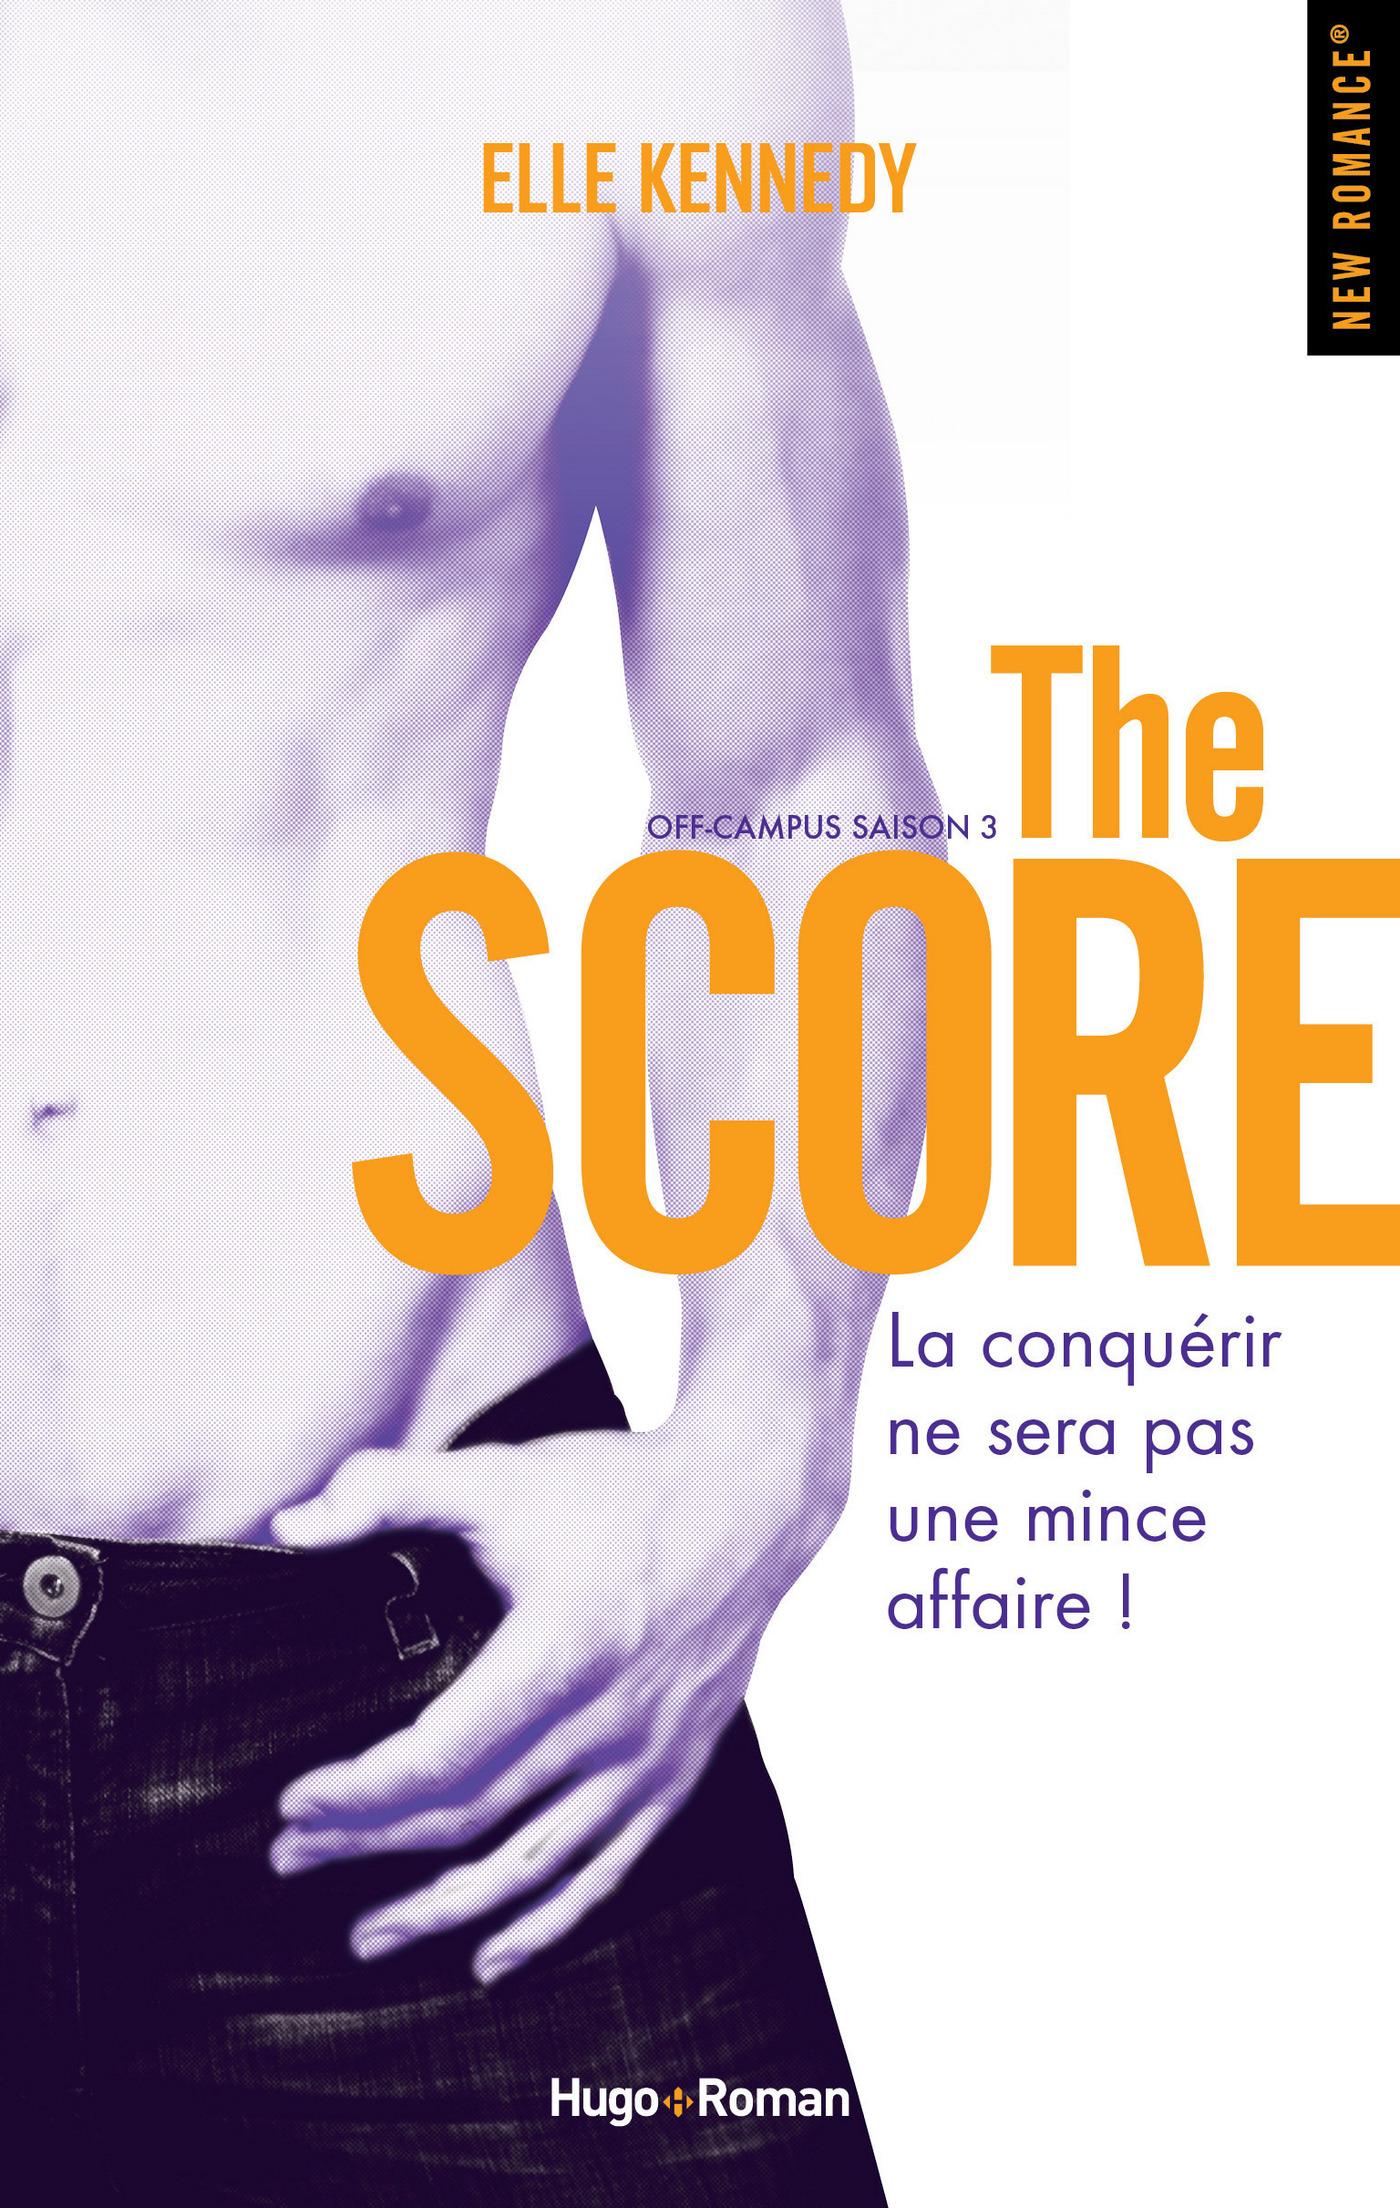 Off campus Saison 3 The score (ebook)